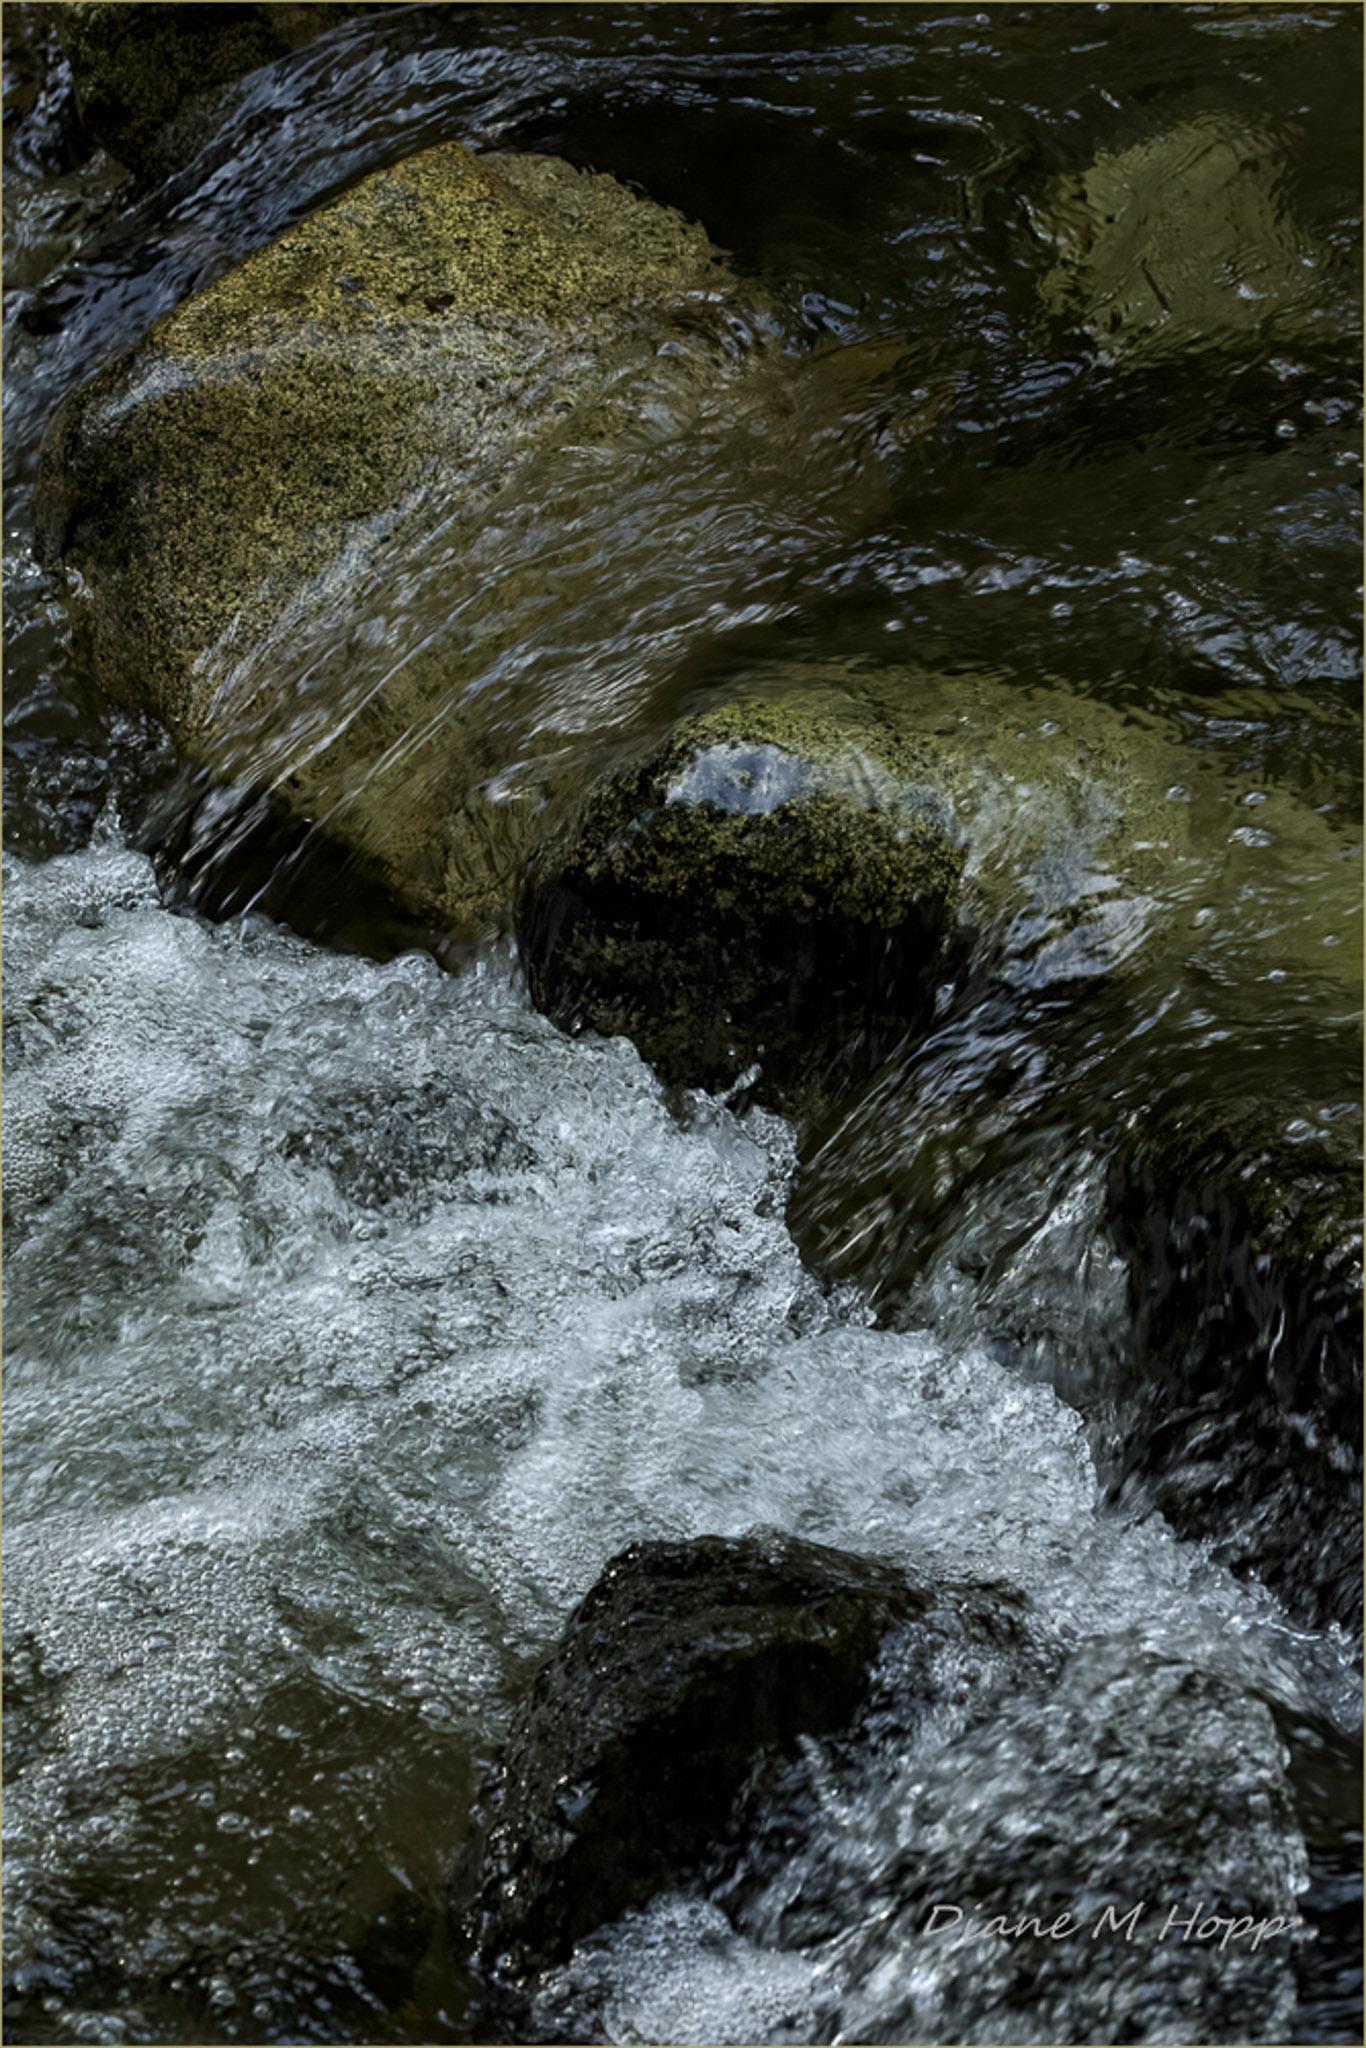 Wet Rocks and Bubbles - DMHopp